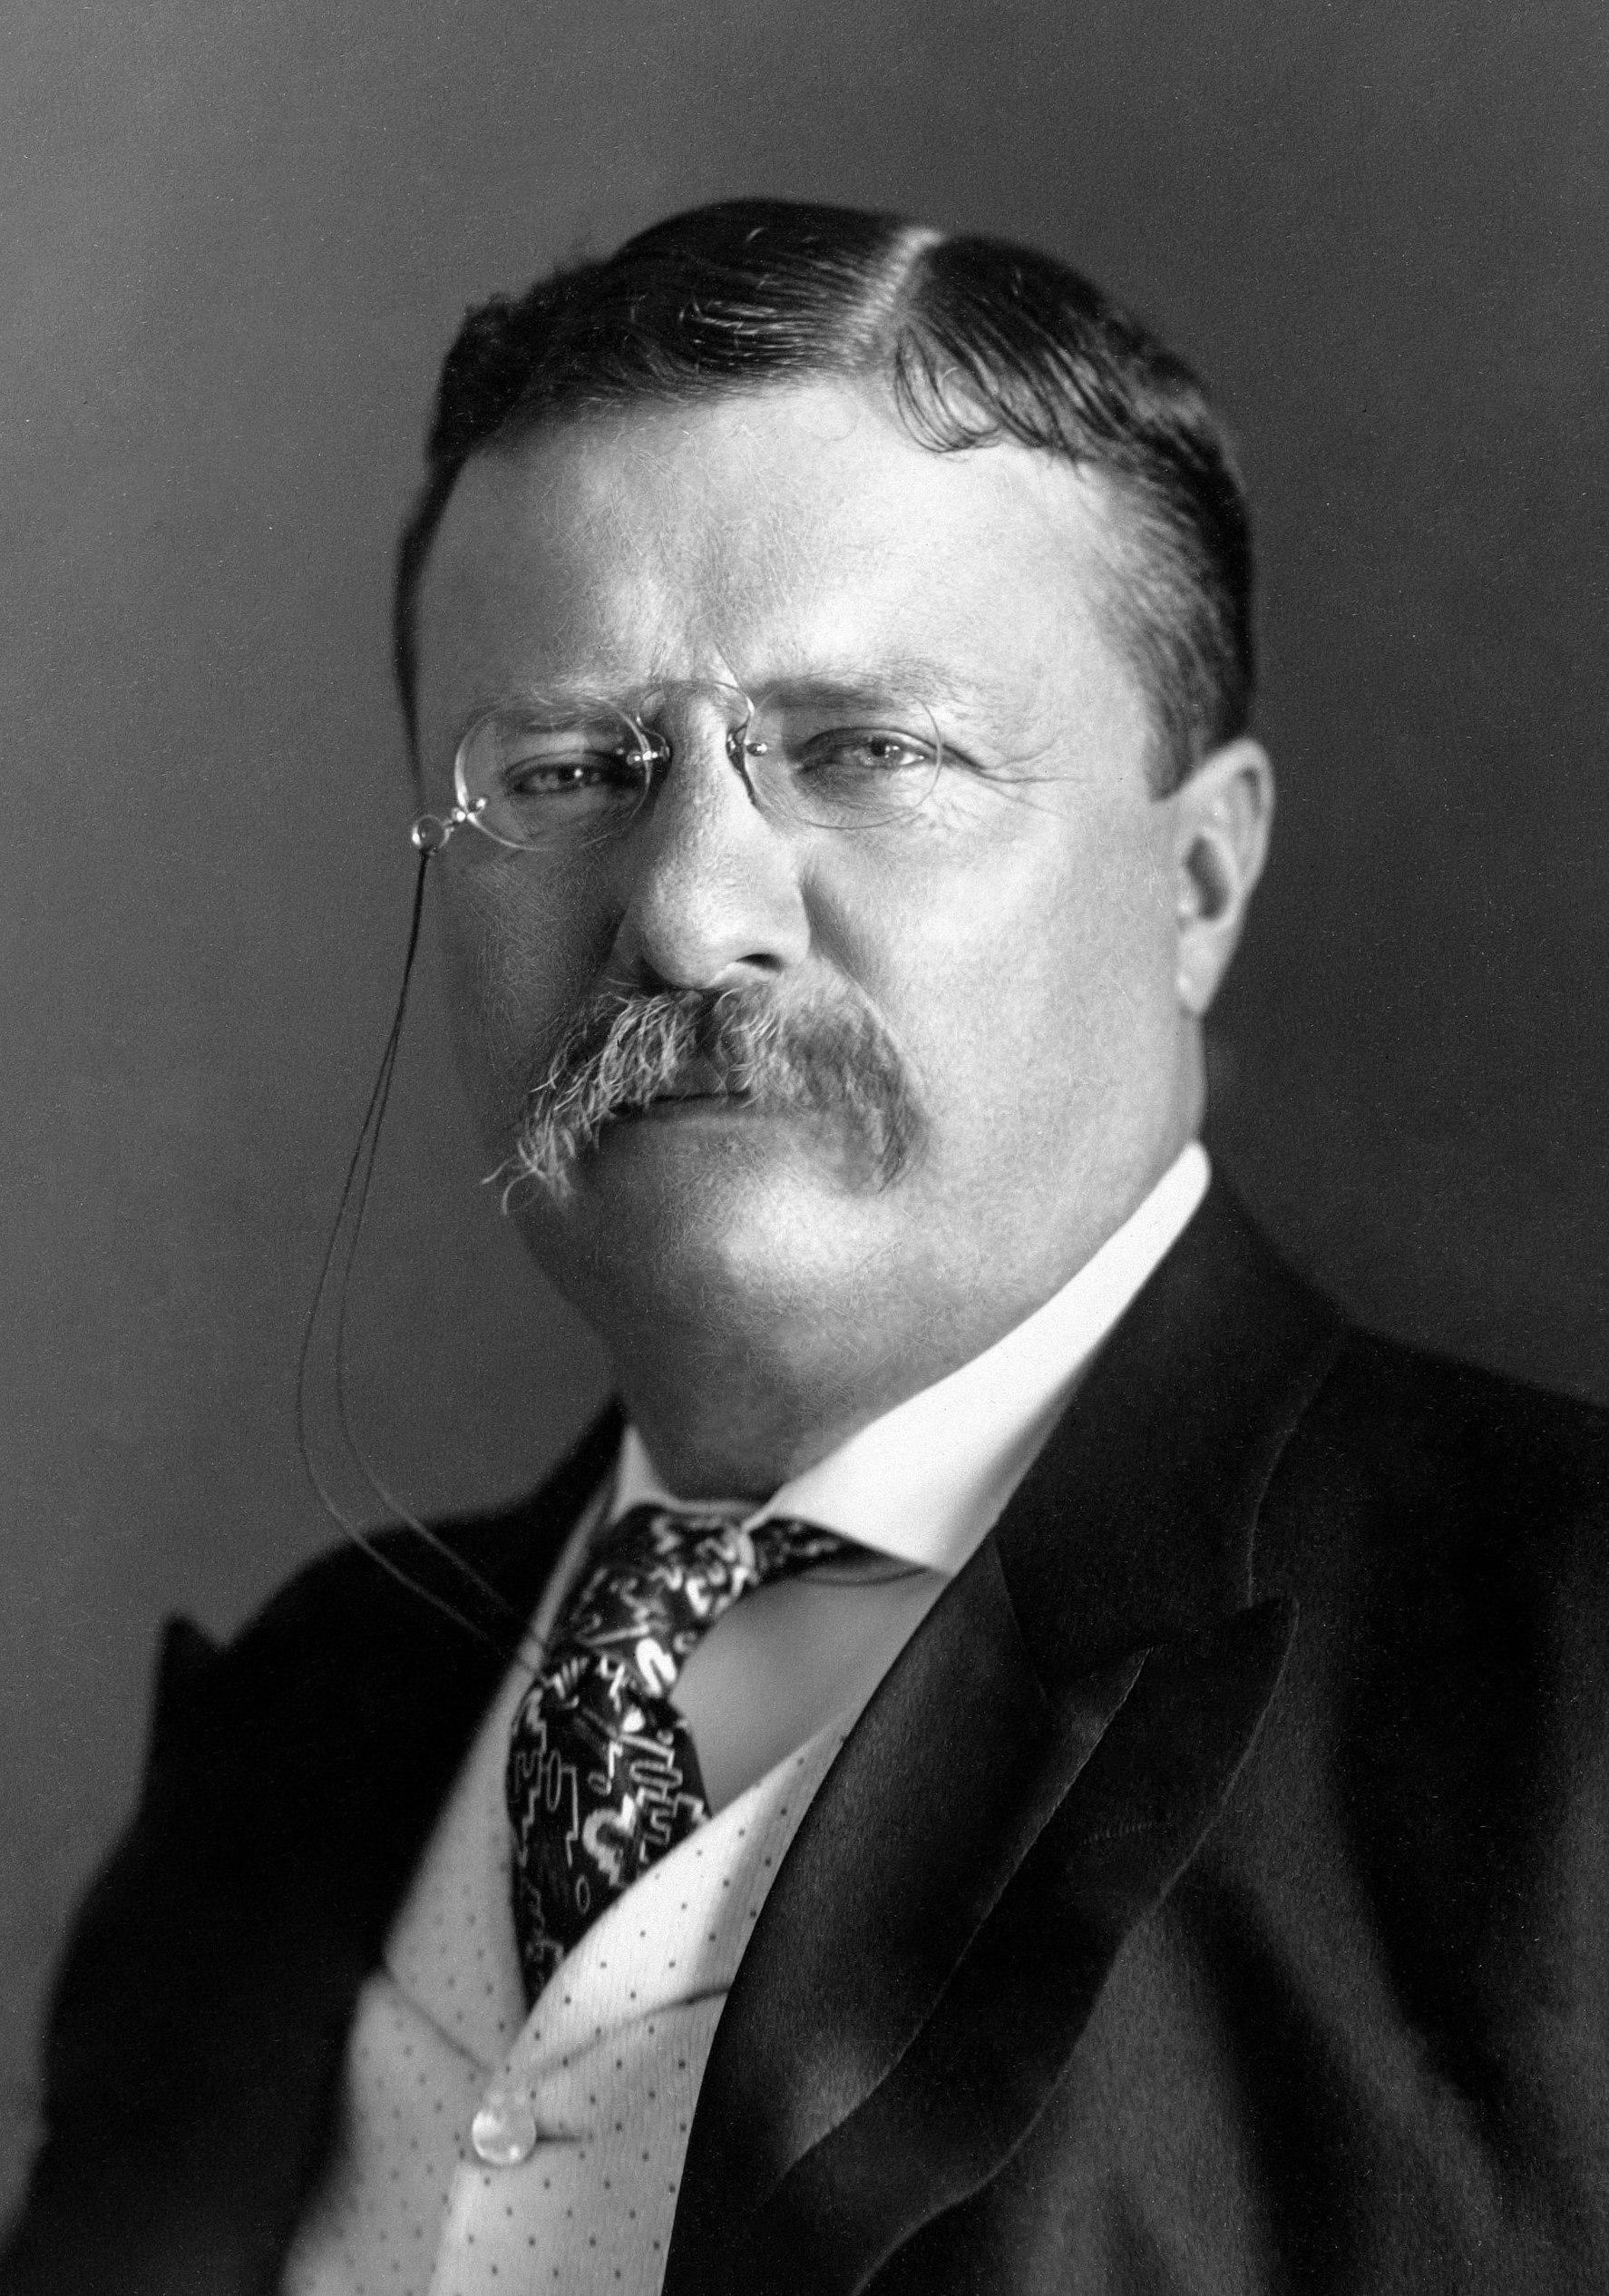 Theodore Roosevelt in 1904